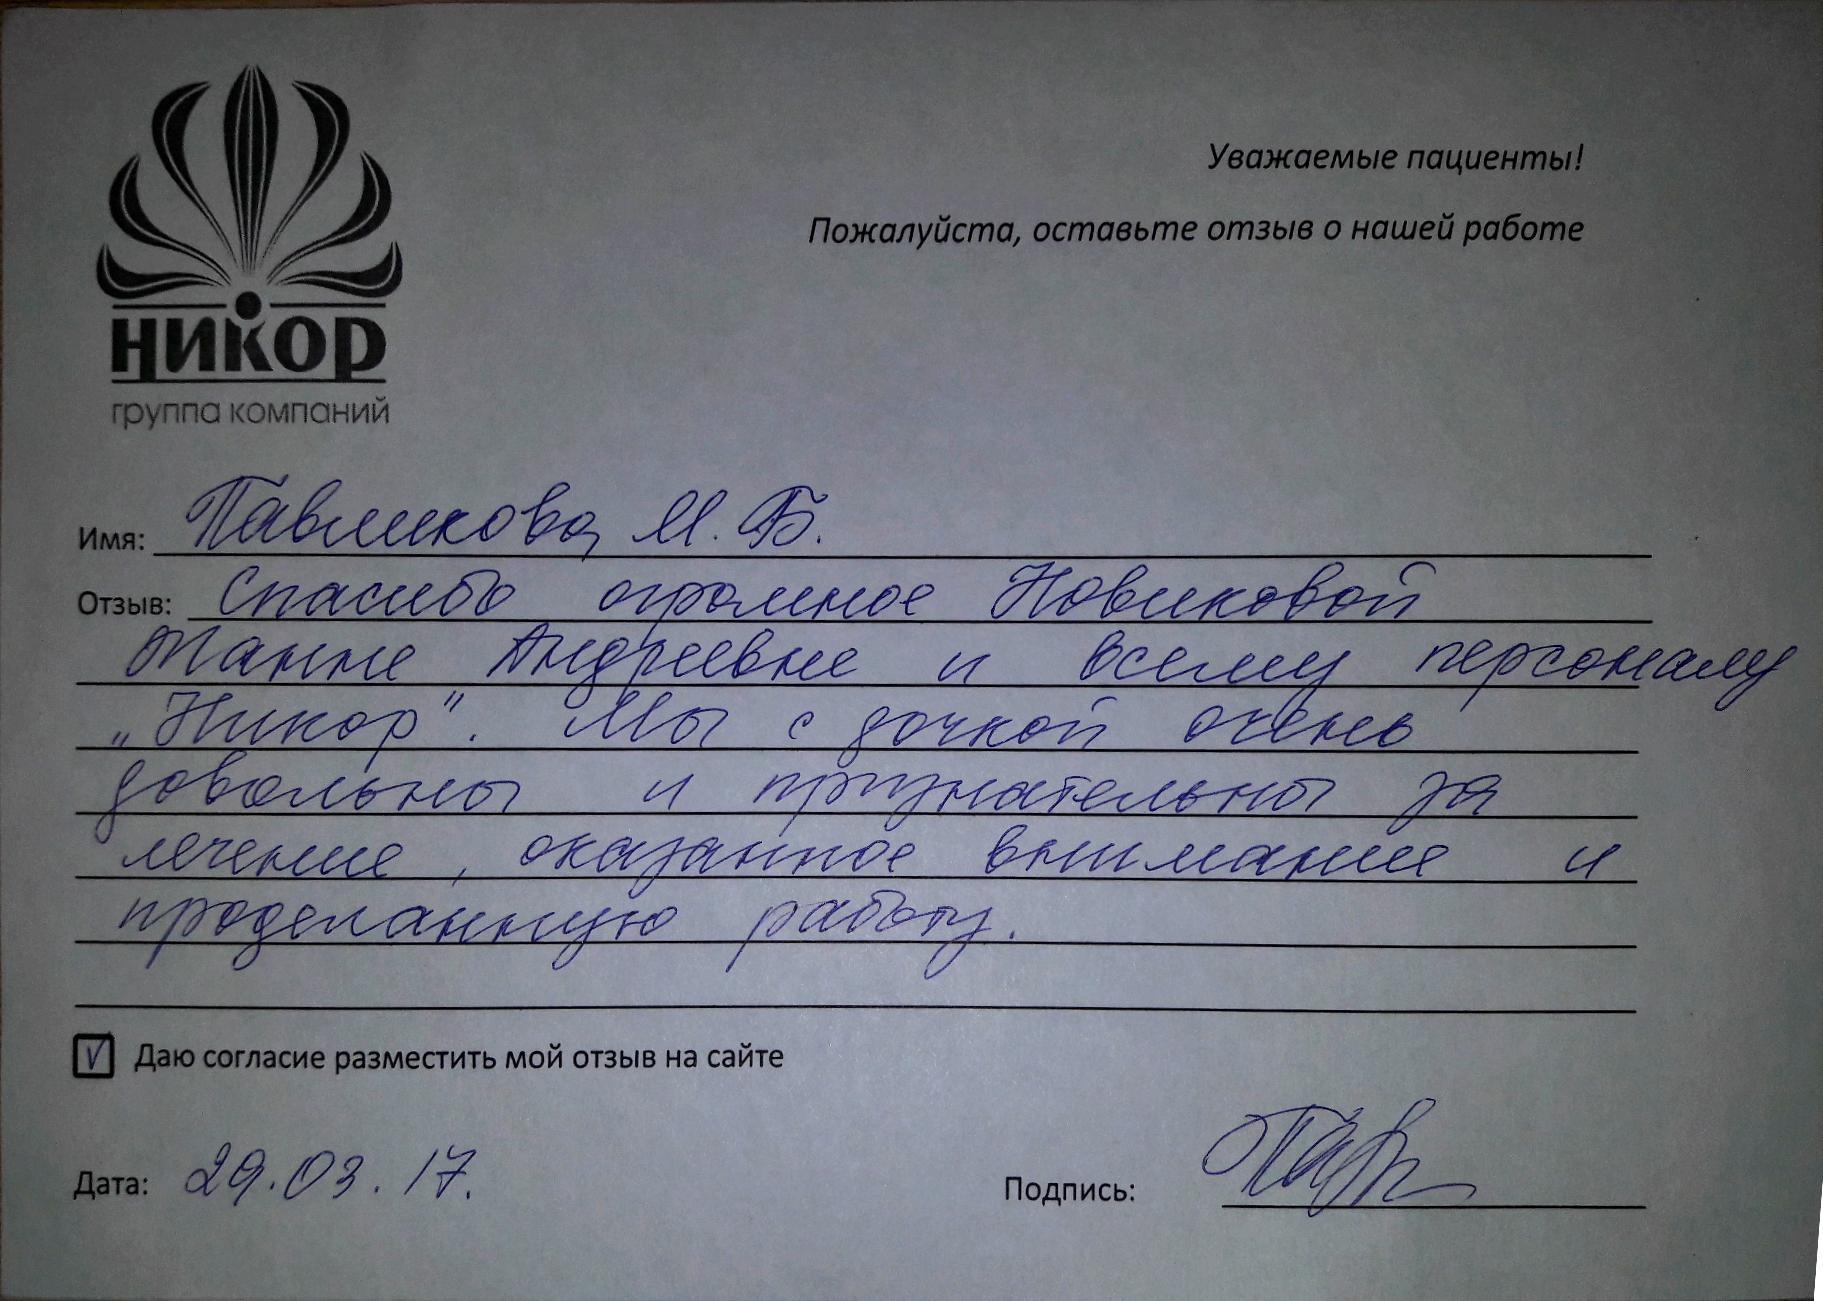 Павликова М. Б.